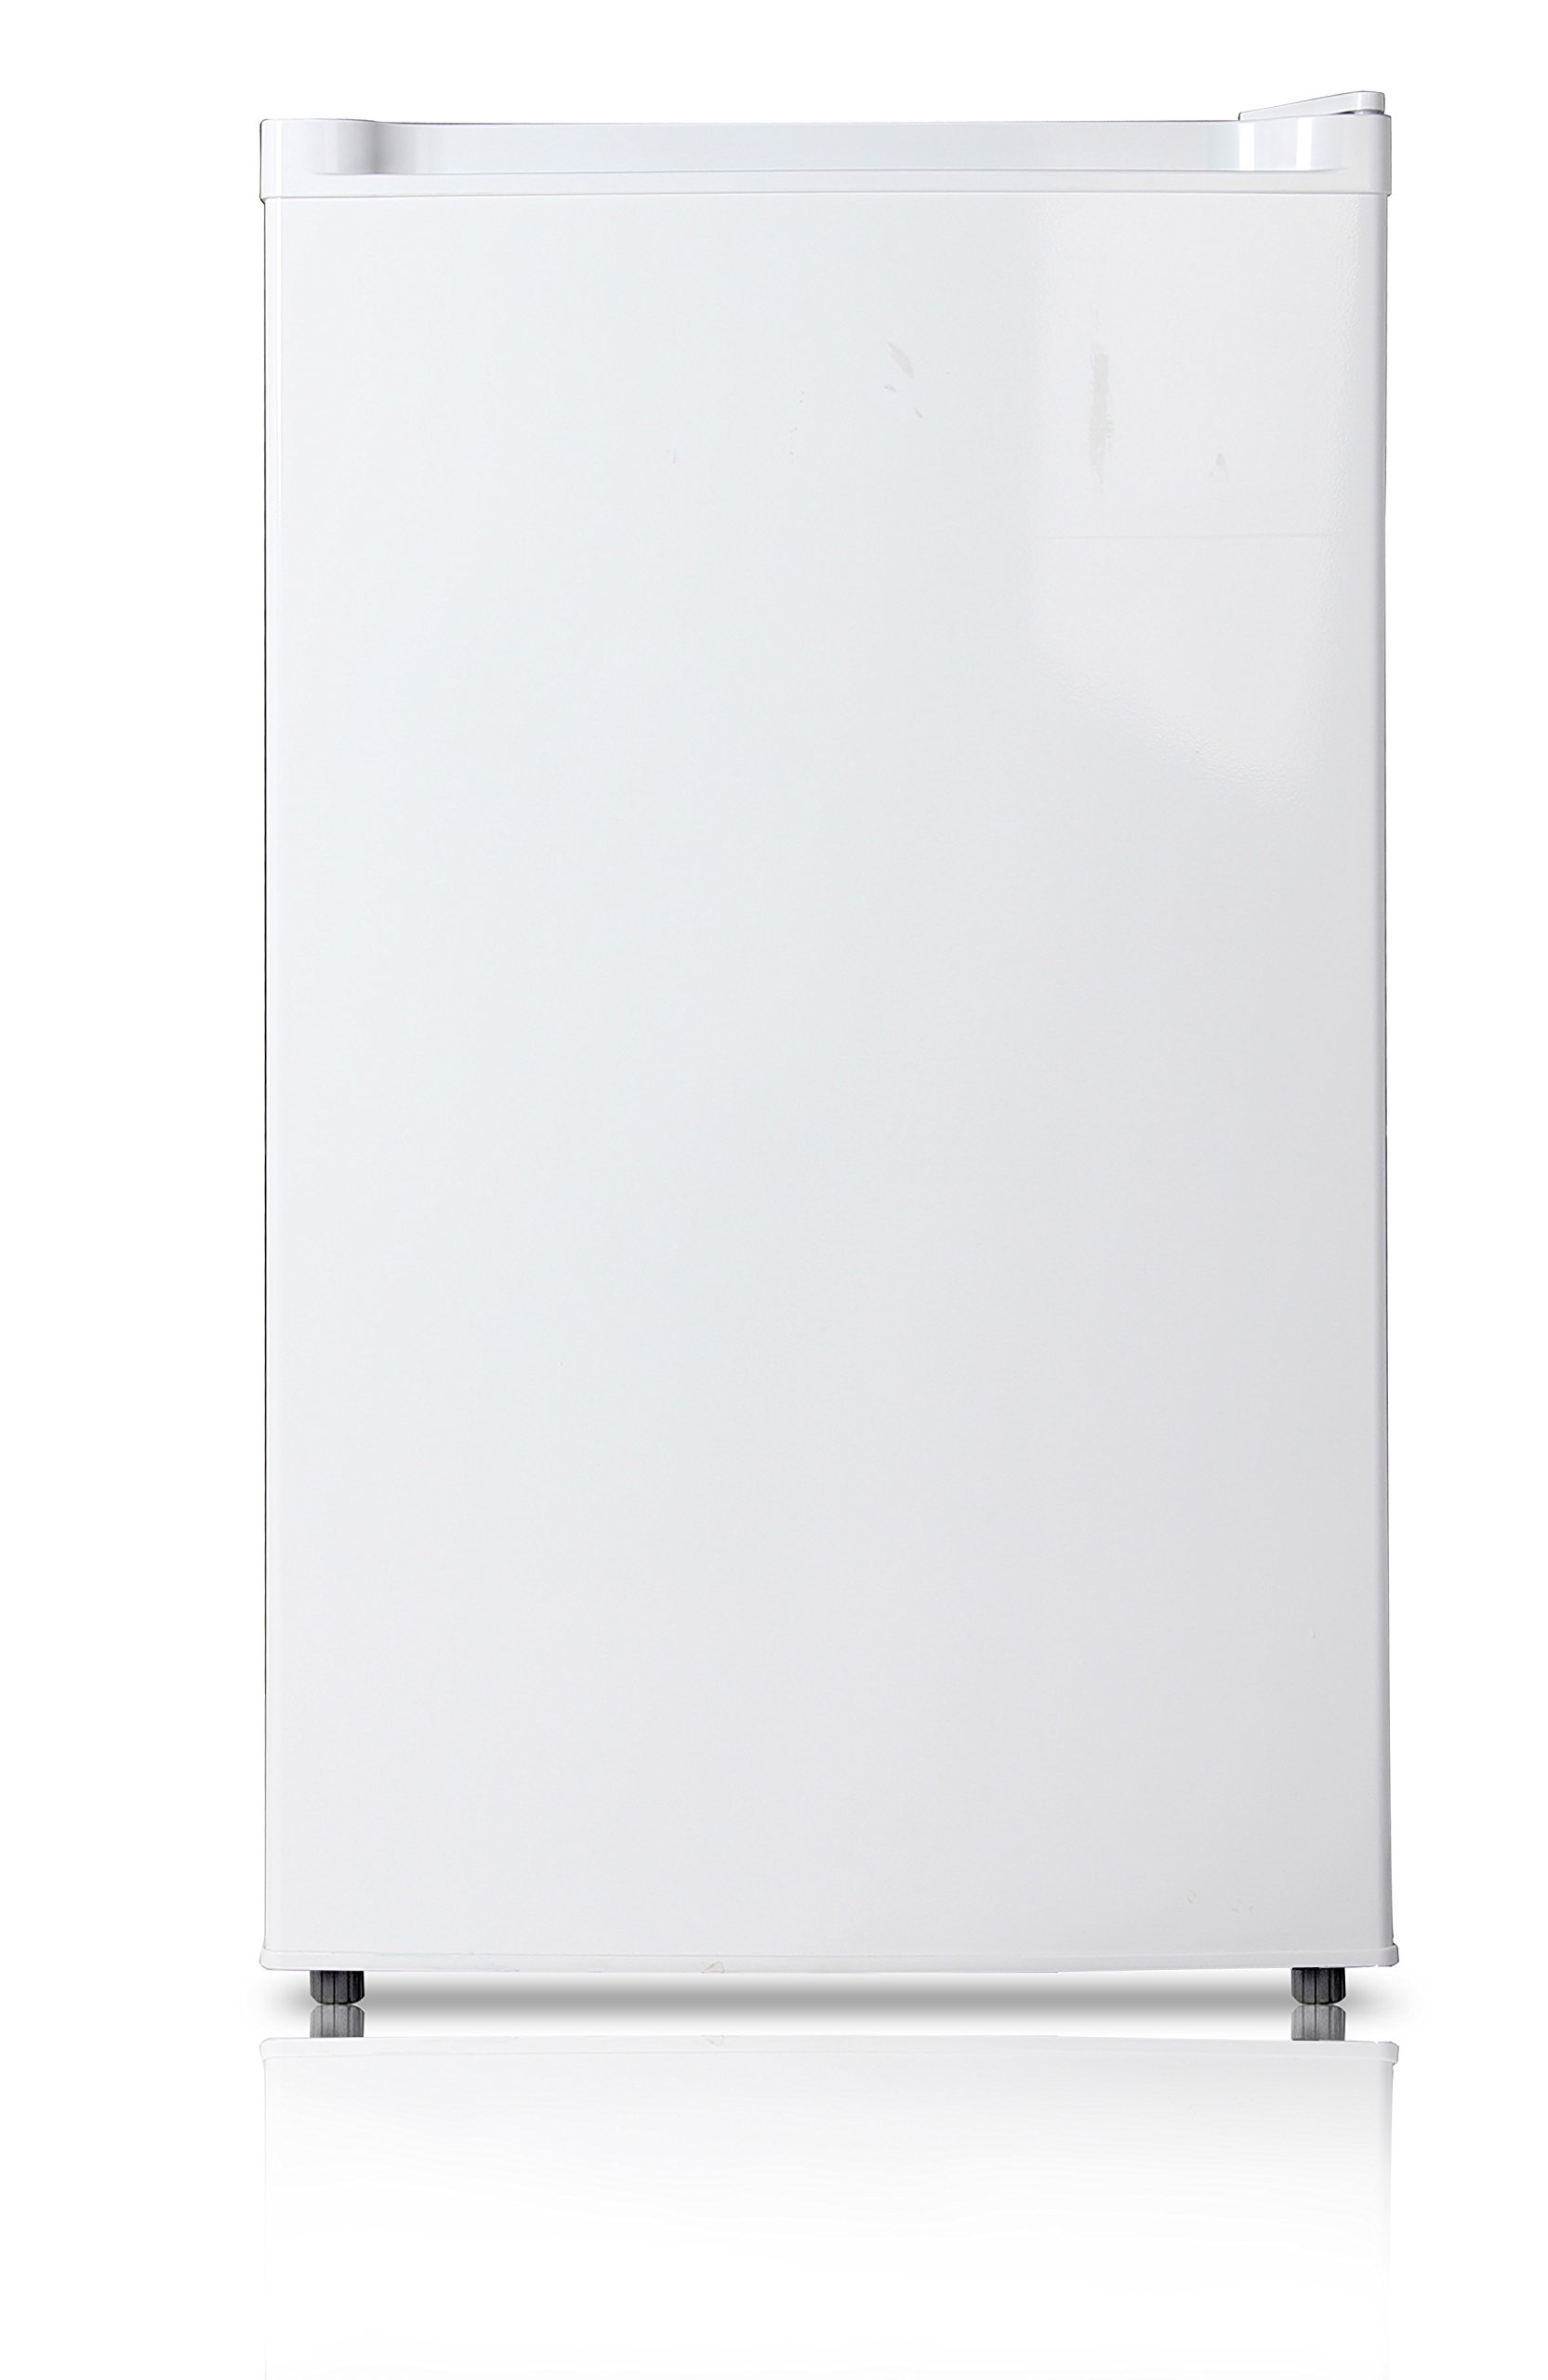 Midea WHS-109FW1 Compact Single Reversible Door Upright Freezer, 3.0 Cubic Feet, White